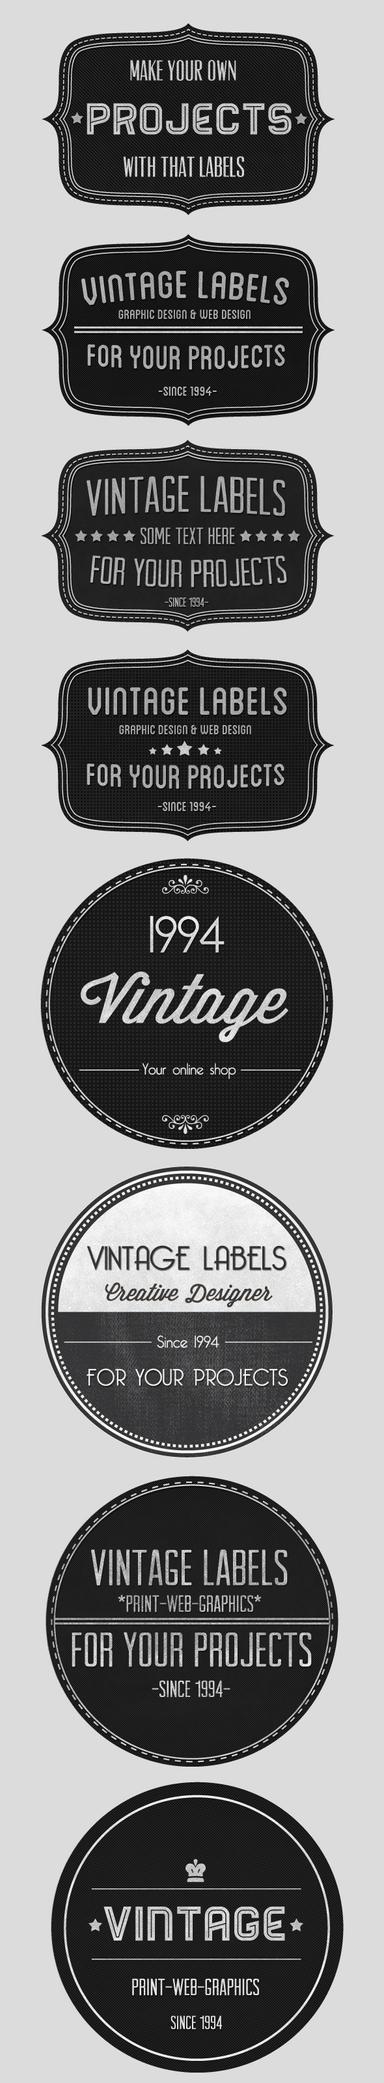 Vintage Badges Set by Nyz87